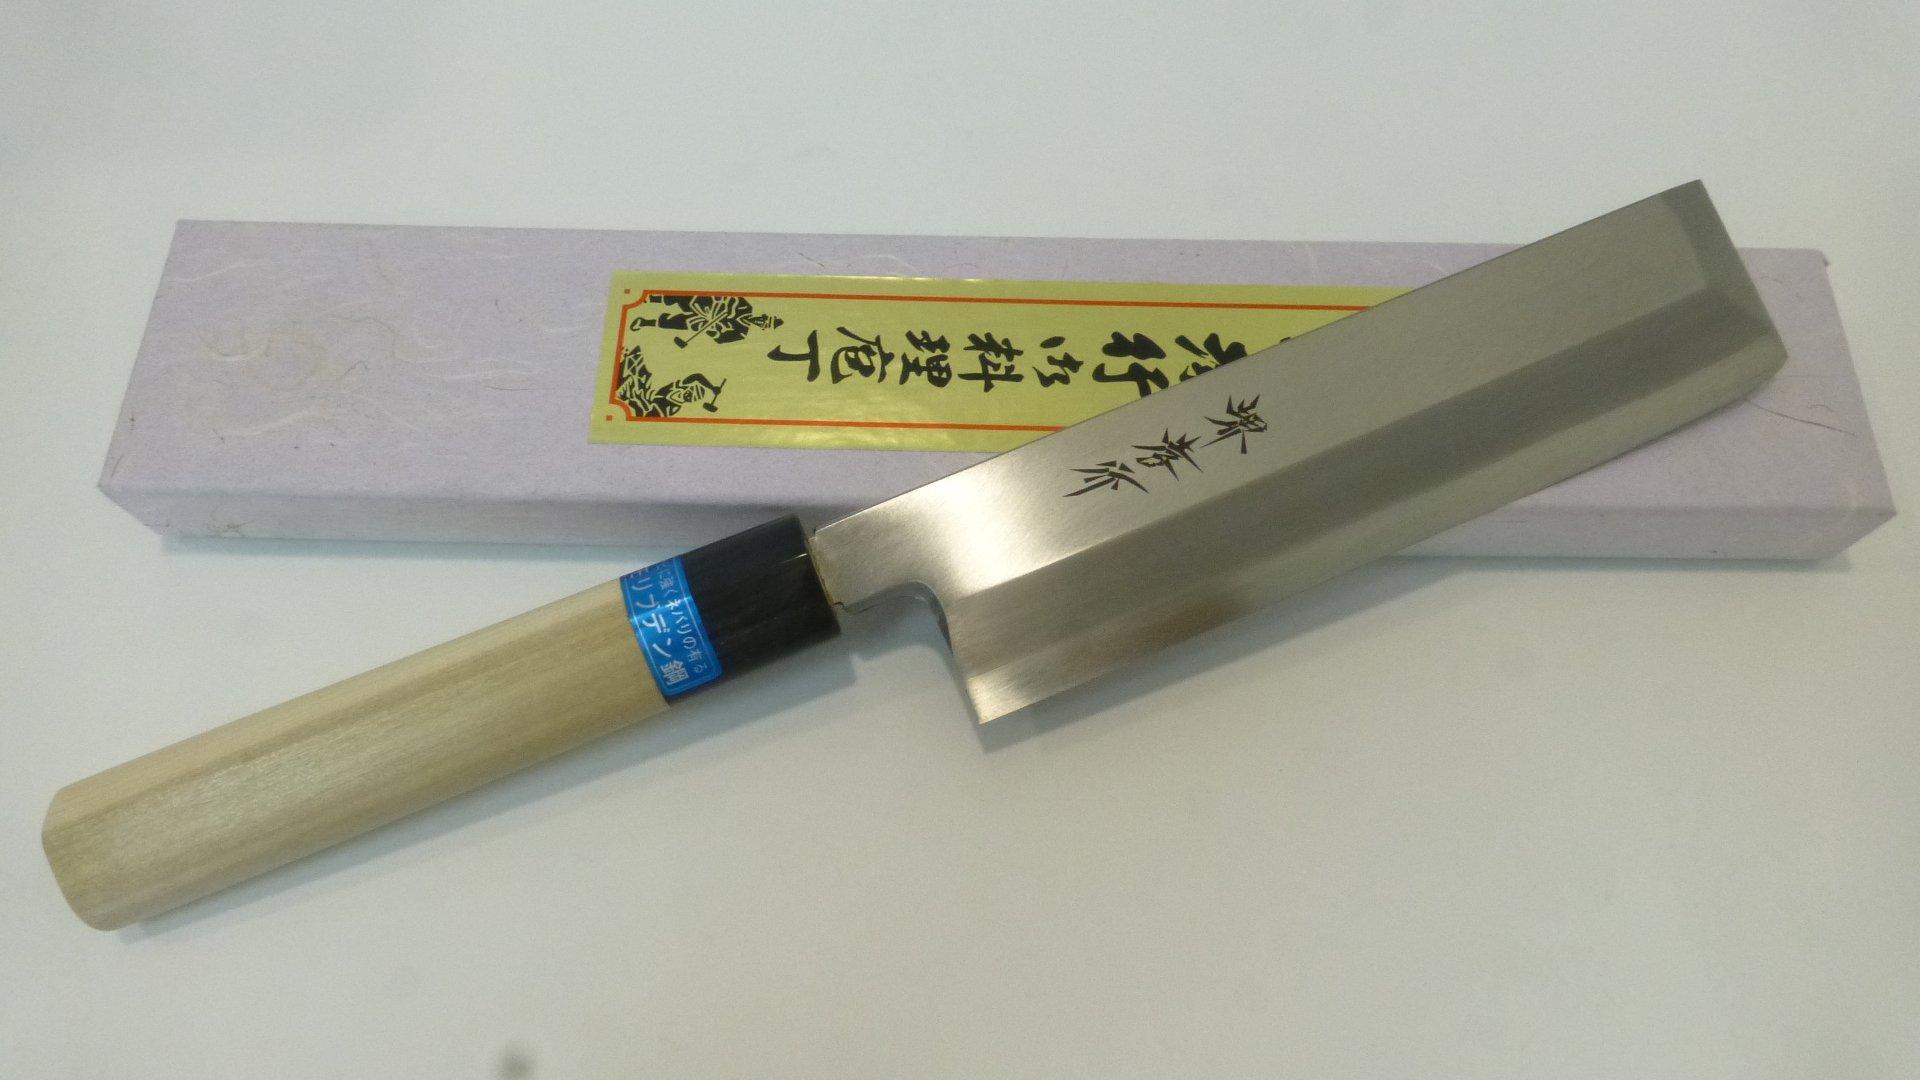 Vegetable Usuba Knife 7.1''/180mm INOX by Sakai Takayuki